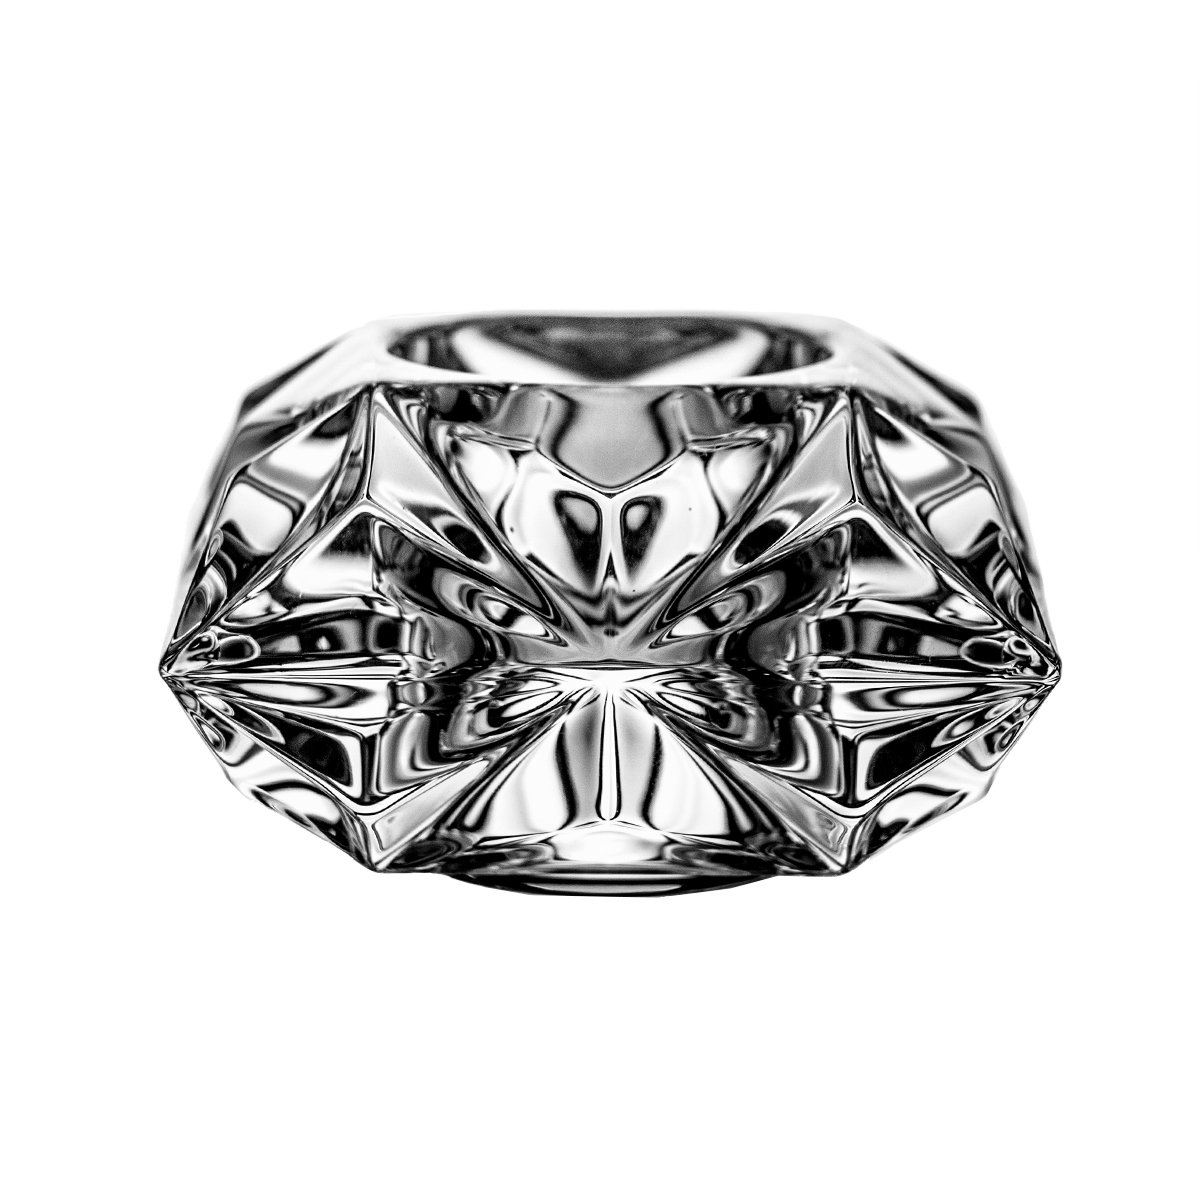 7x7x8 cm Crystaljulia Candelero Cristal